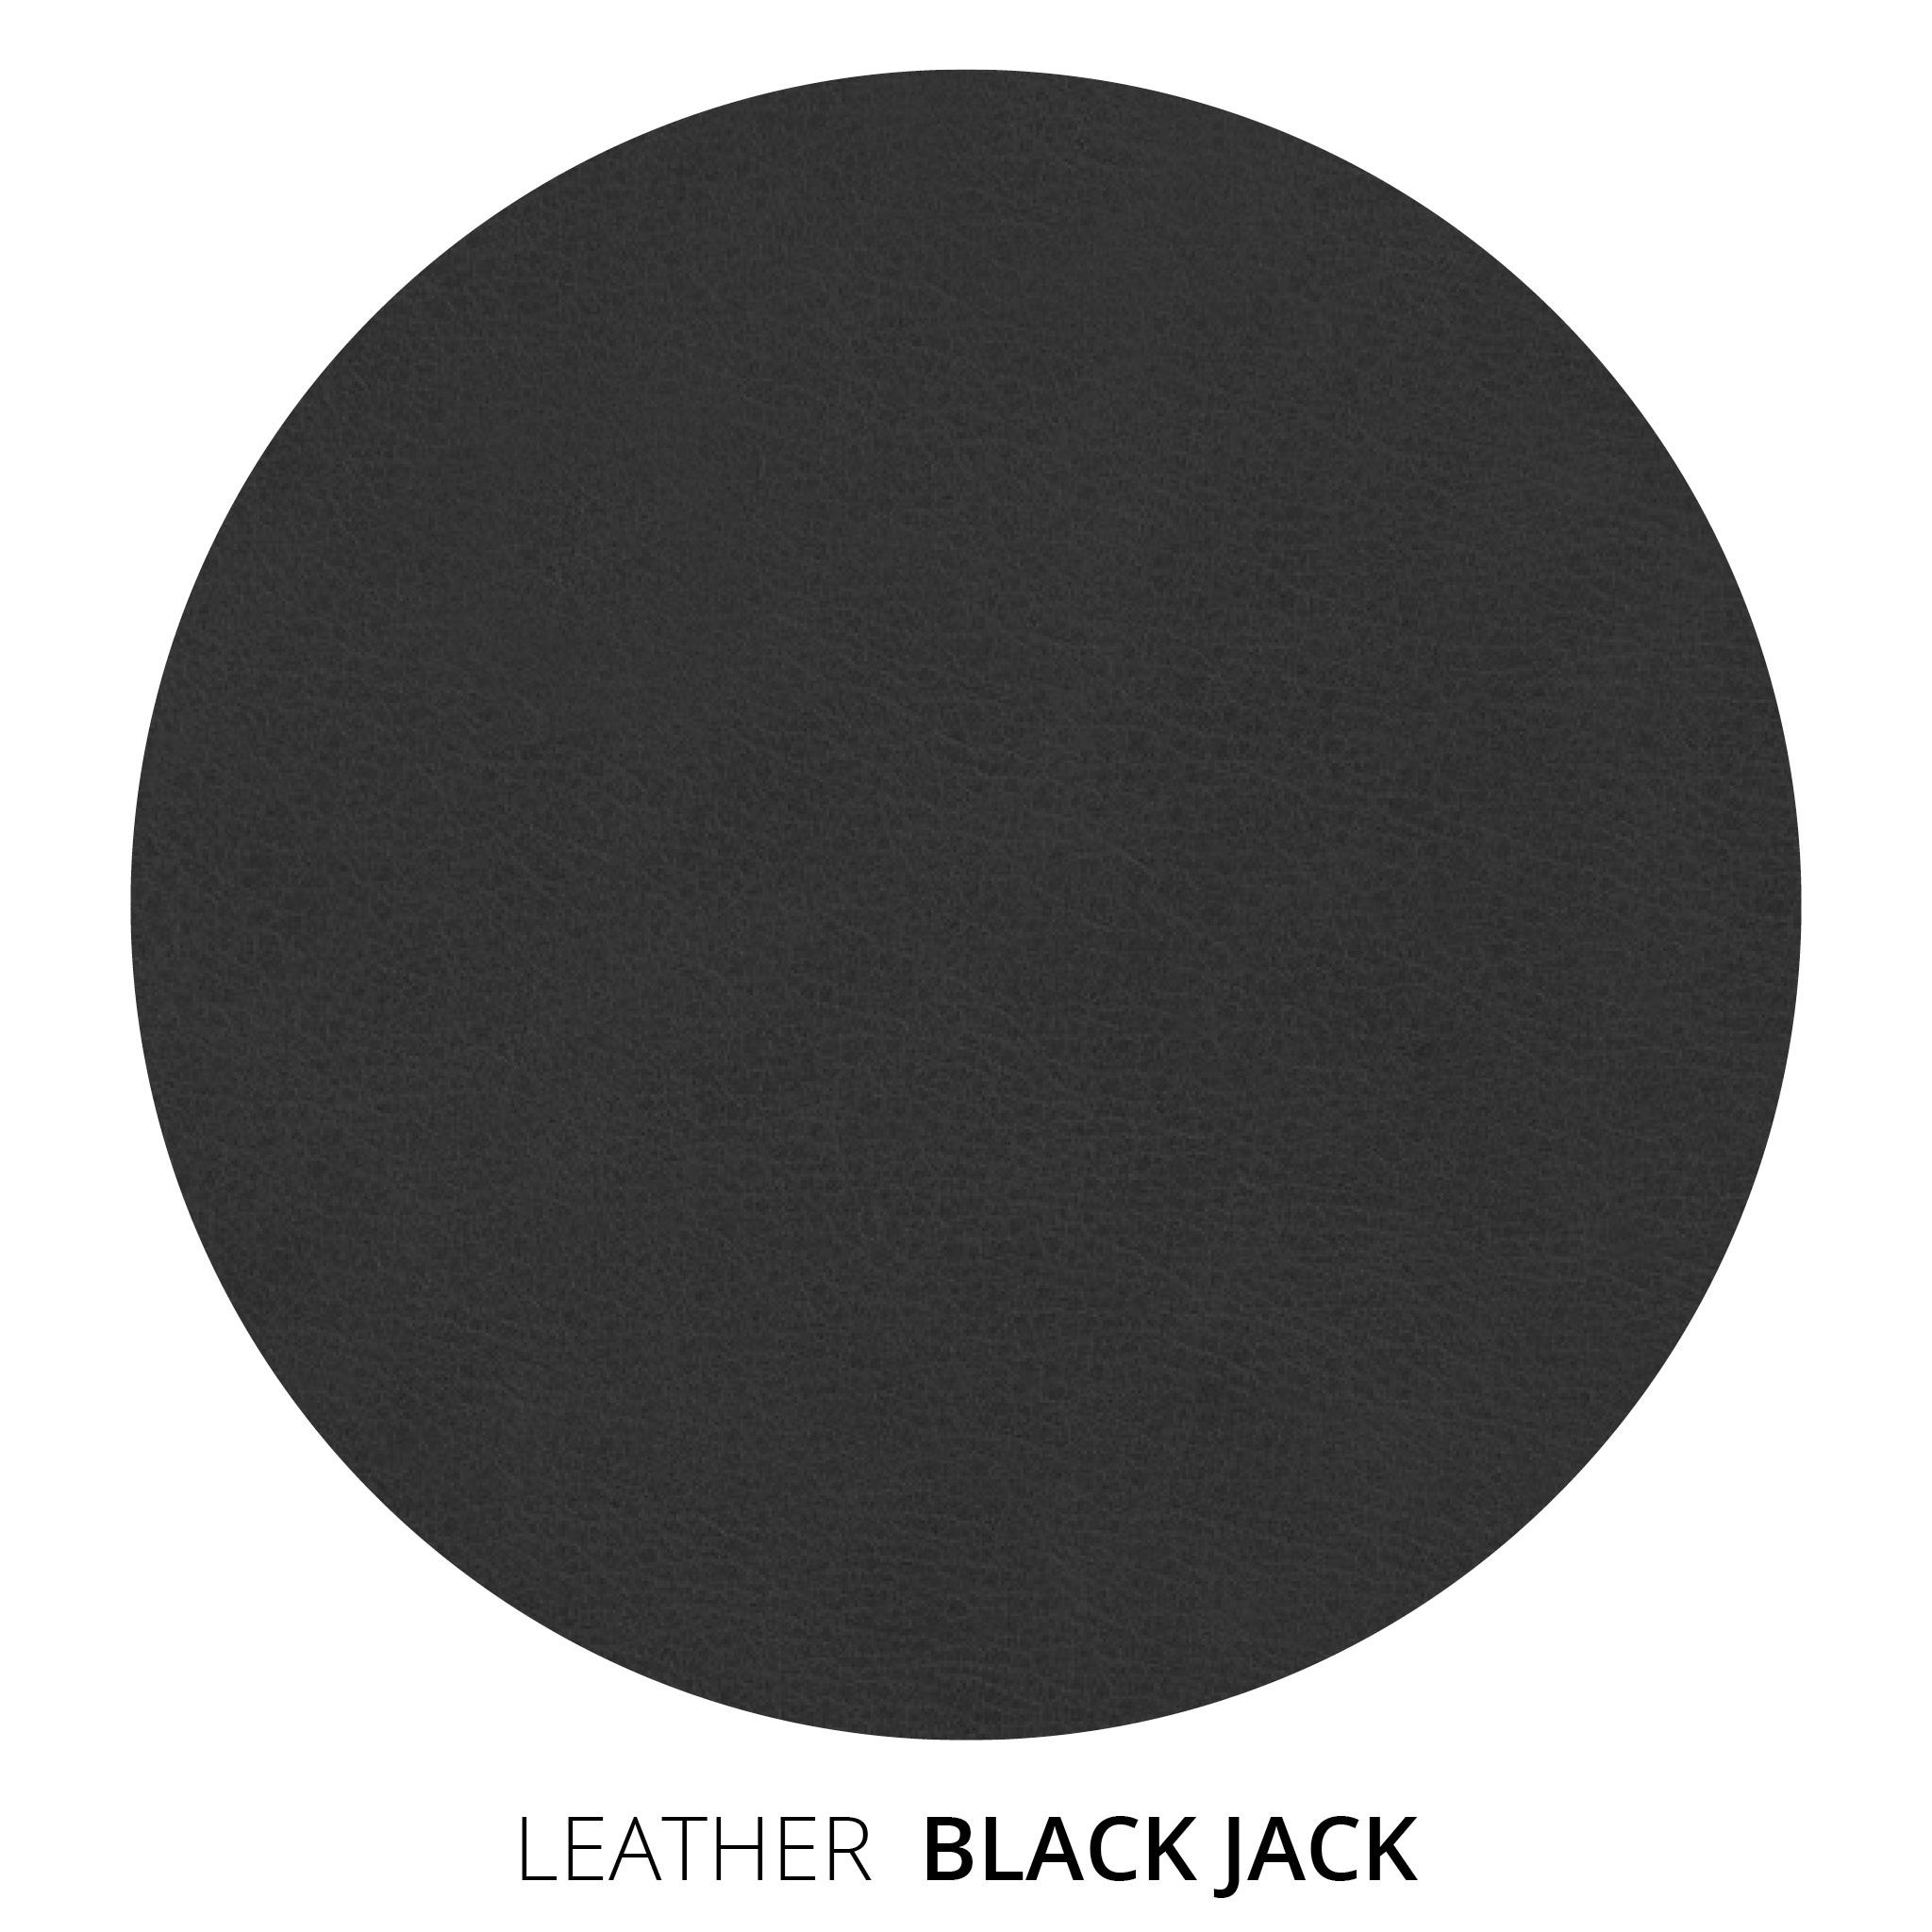 Black Jack Leather Swatch